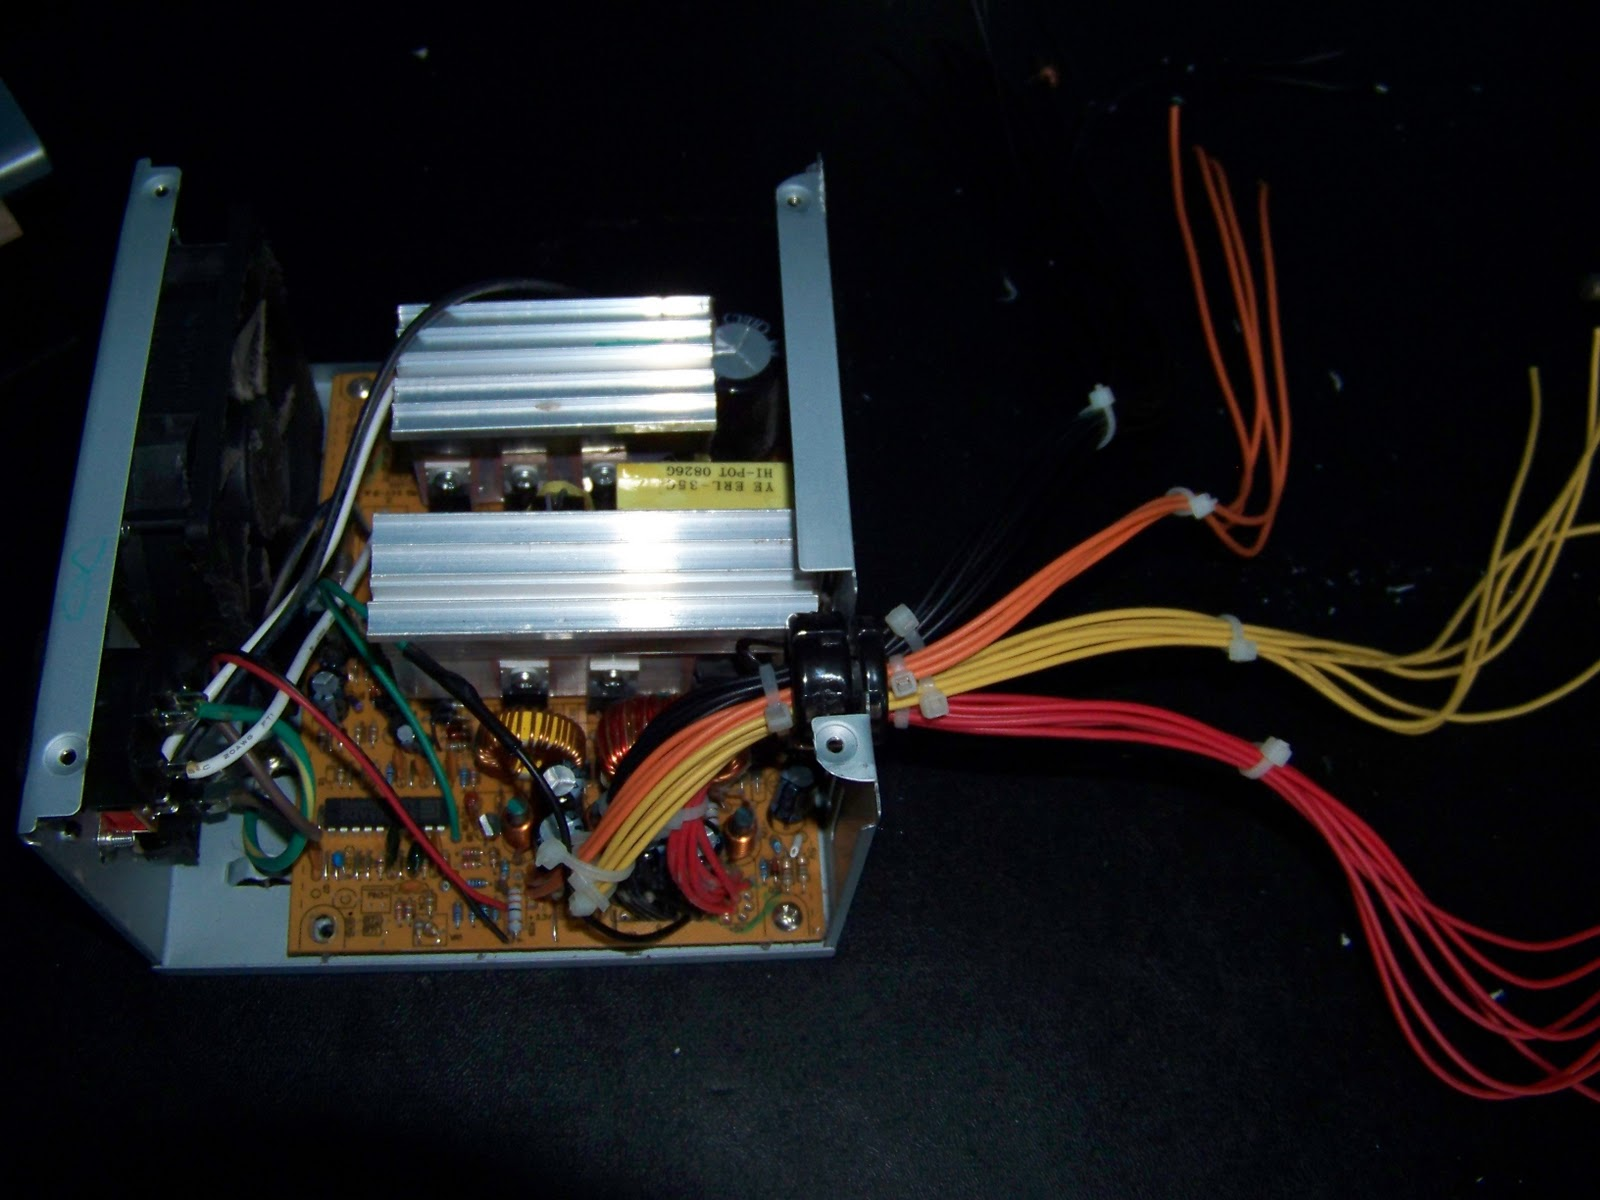 Http 000vmms3amazonawscom Printrbot Files 2011 08 Circuit Wallpaper 16285 101 0835